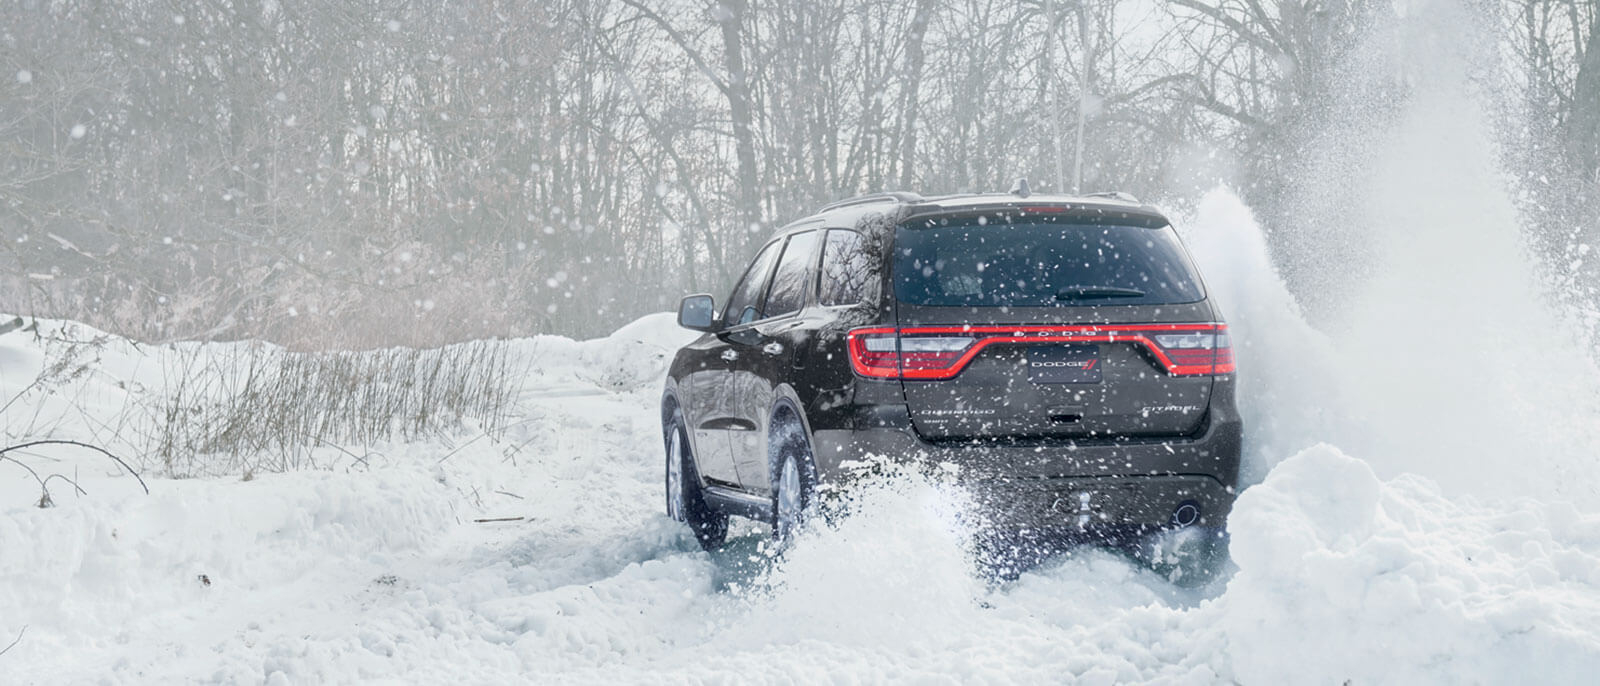 2016 Dodge Durango back view winter scene